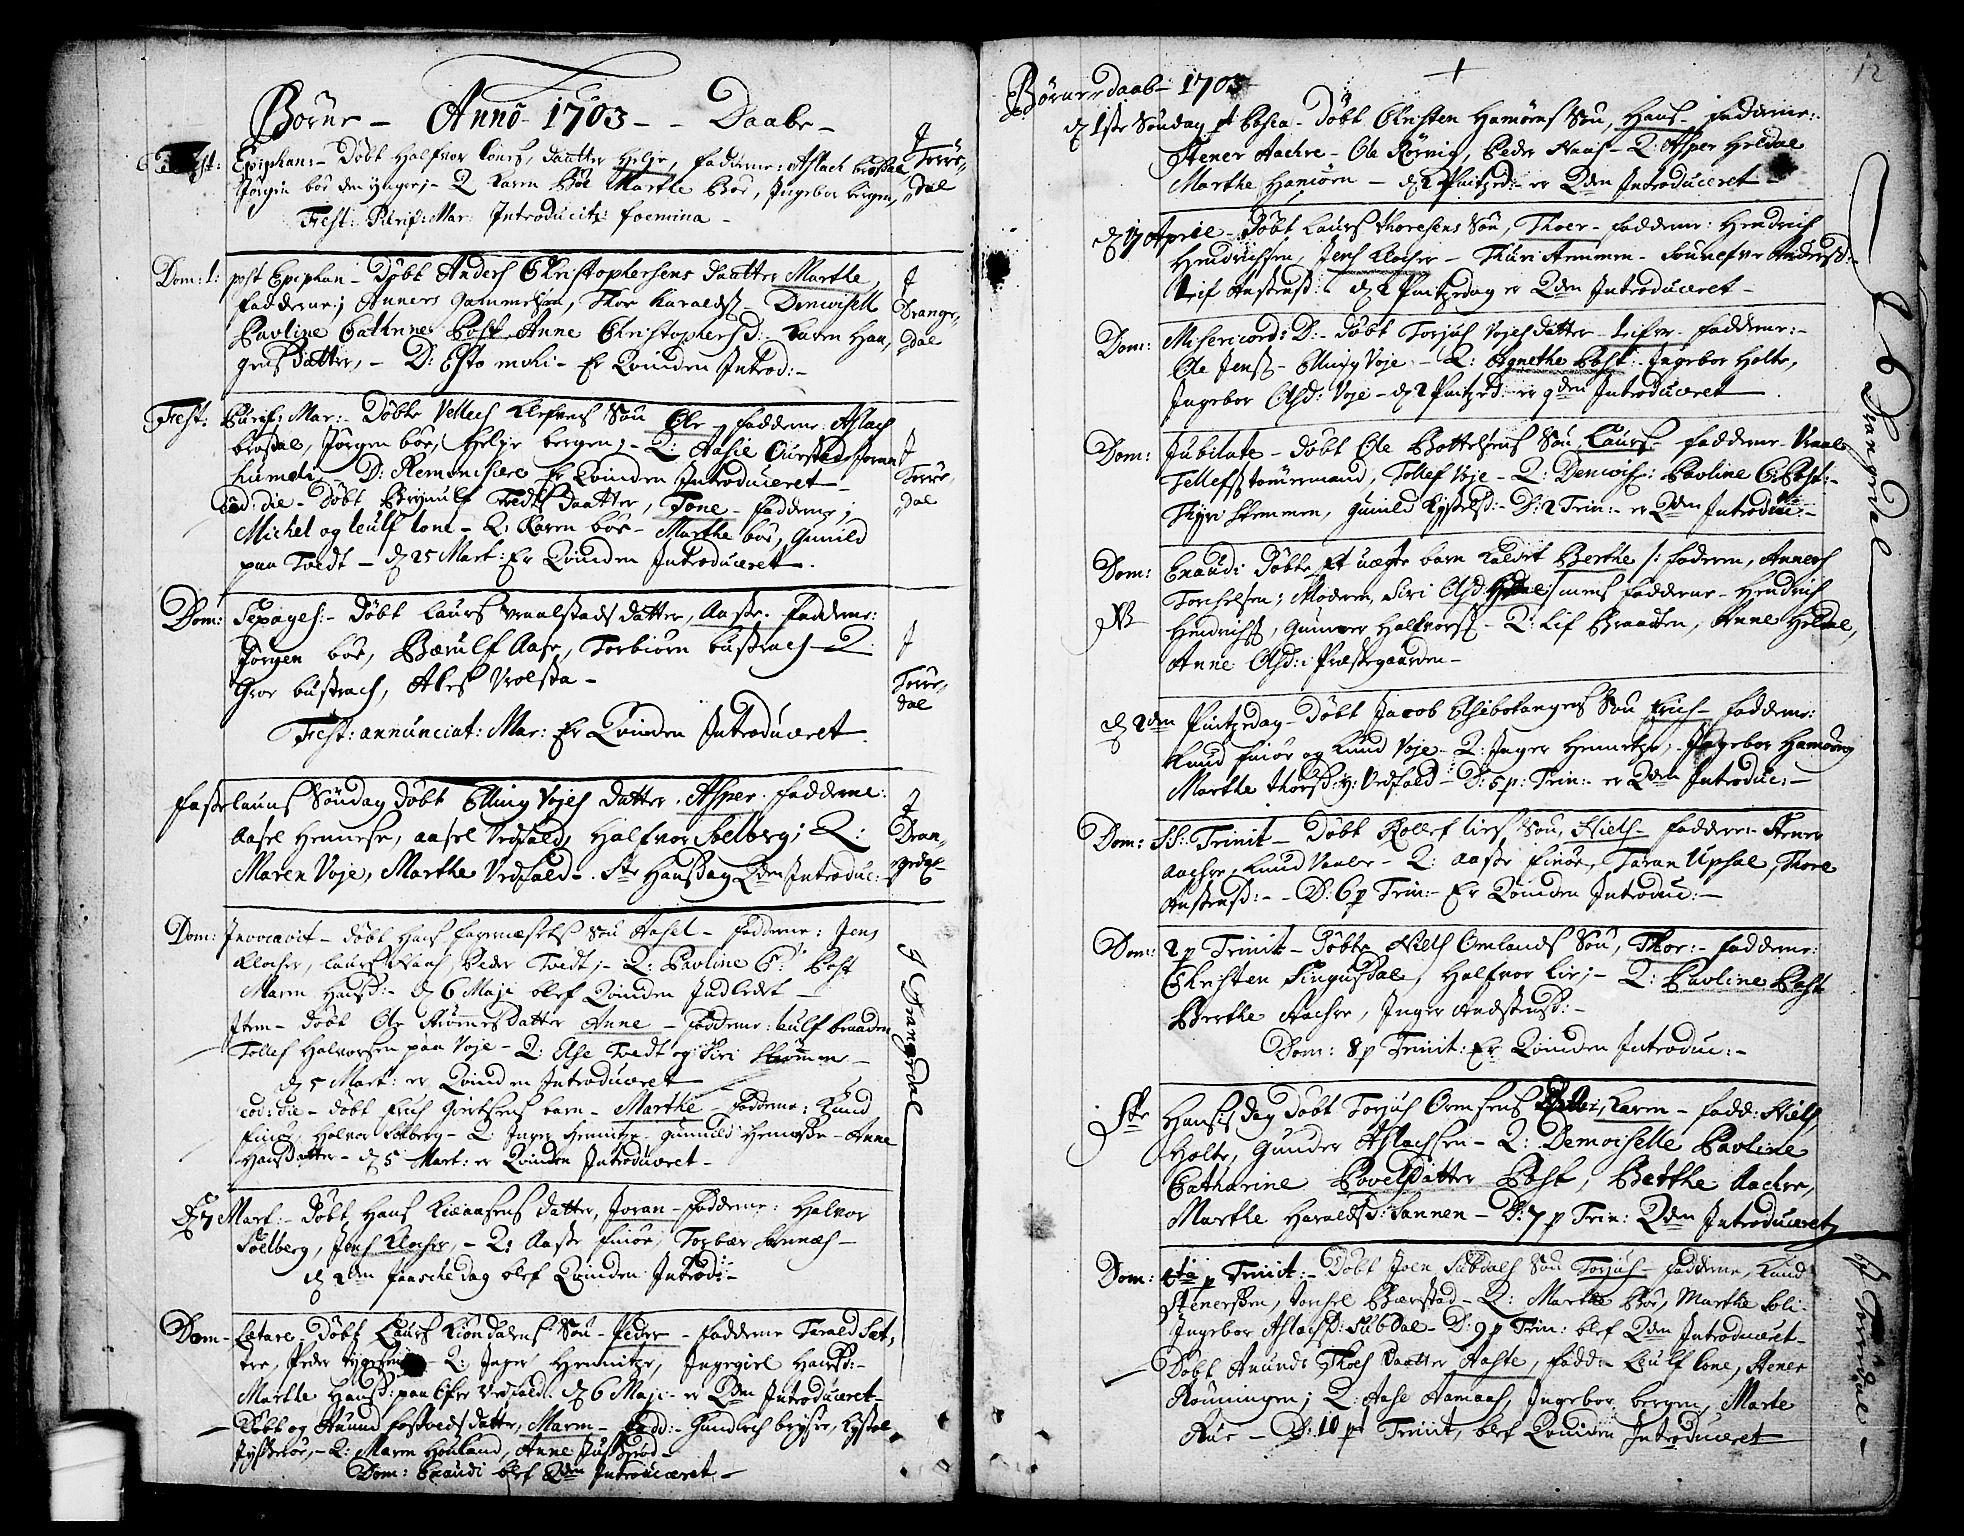 SAKO, Drangedal kirkebøker, F/Fa/L0001: Ministerialbok nr. 1, 1697-1767, s. 12